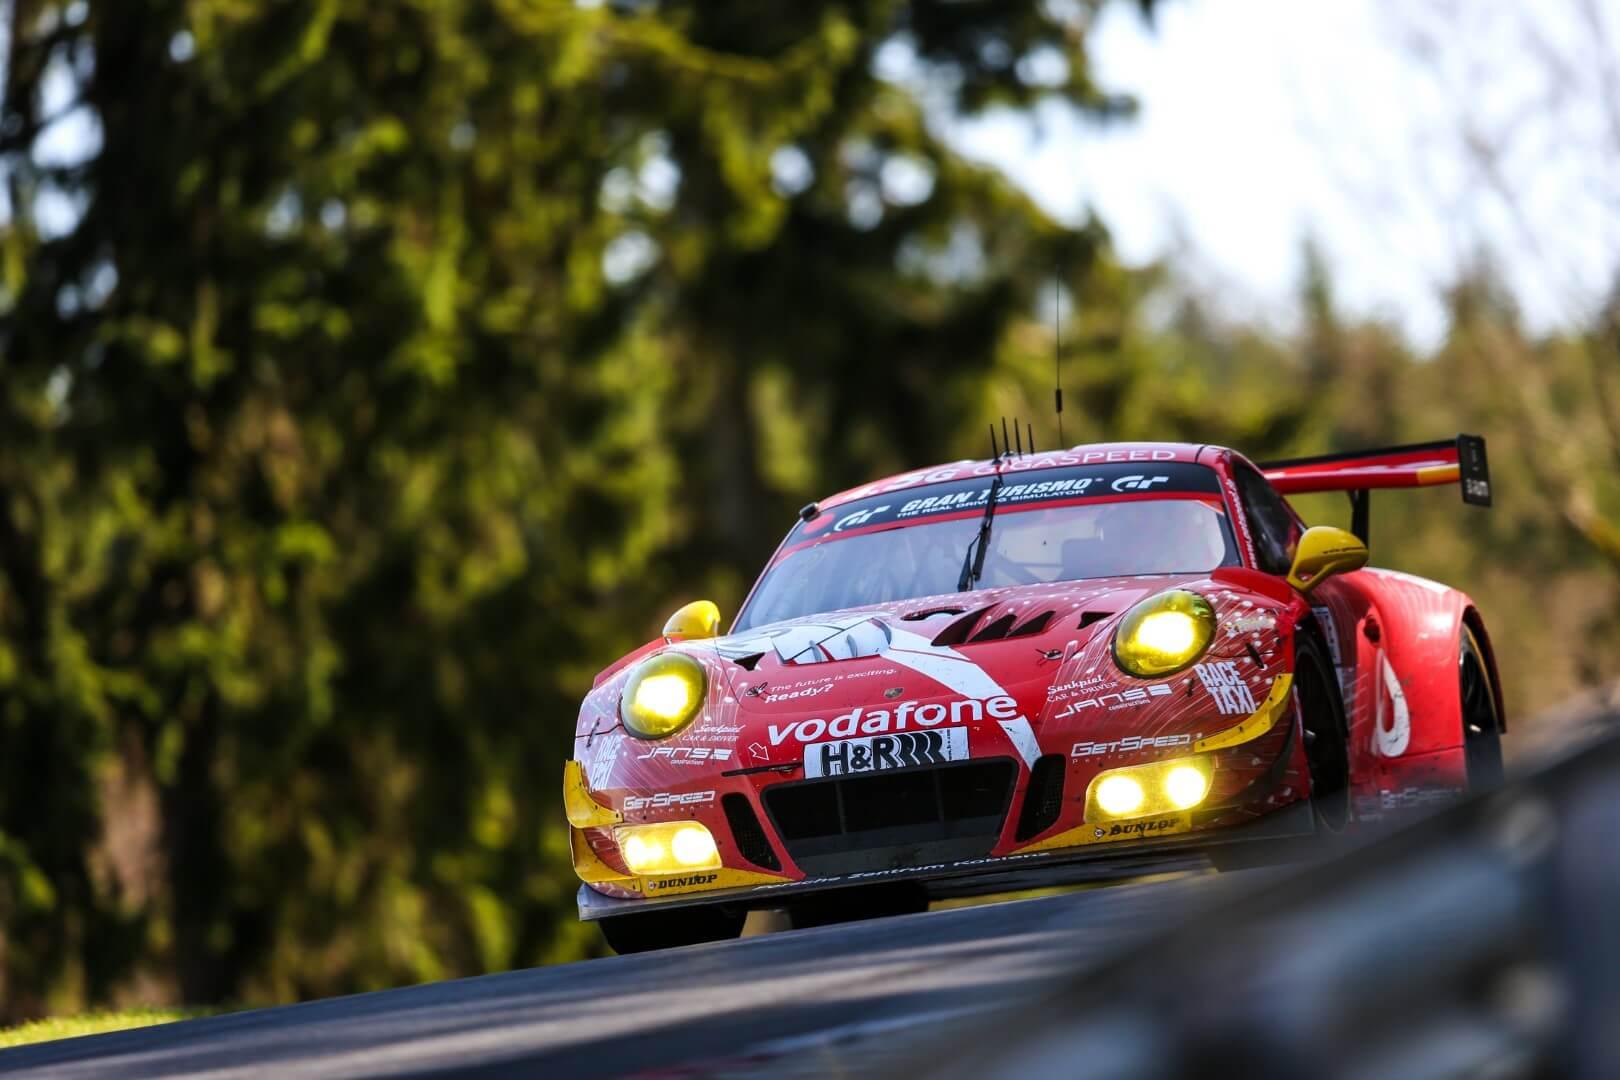 VLN 2. Lauf 2018, Nürburgring-Nordschleife - Foto: Gruppe C Photography; #2 Porsche 911 GT3 R, GIGASPEED Team GetSpeed Performance: Steve Jans, Marek Böckmann